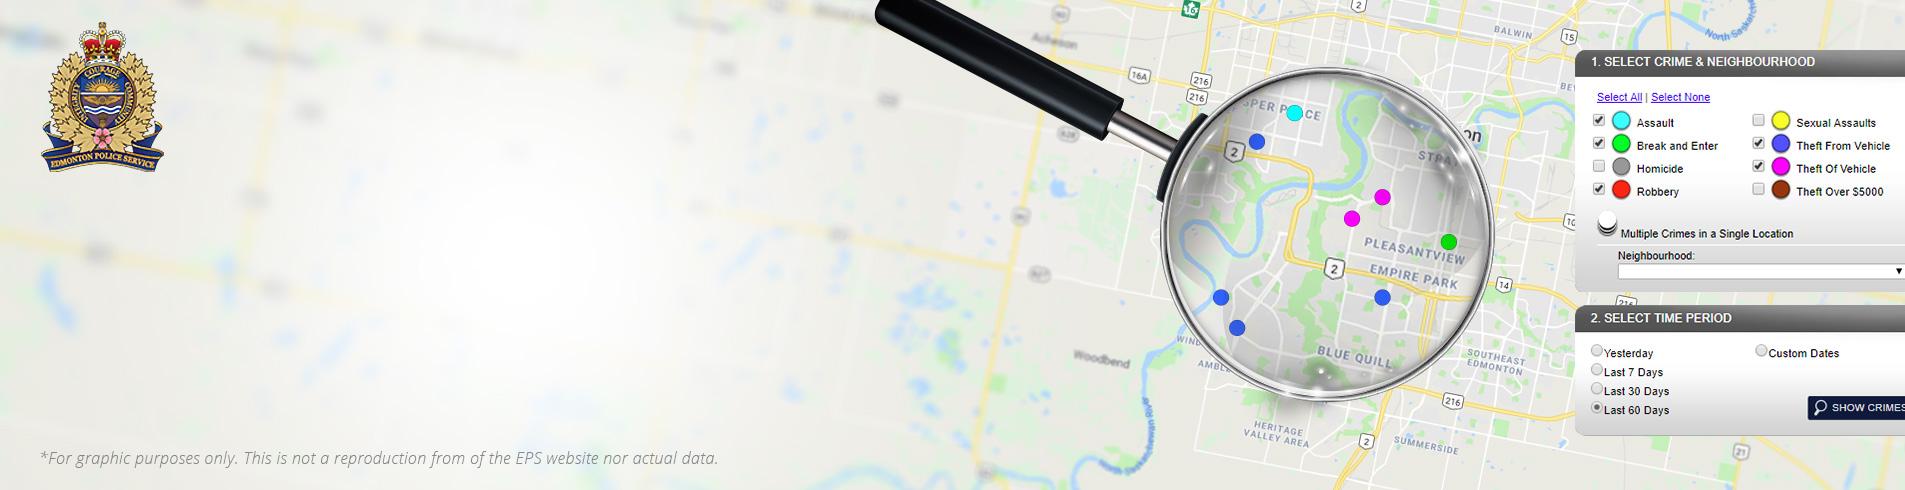 Edmonton-Police-Crime-Mapping